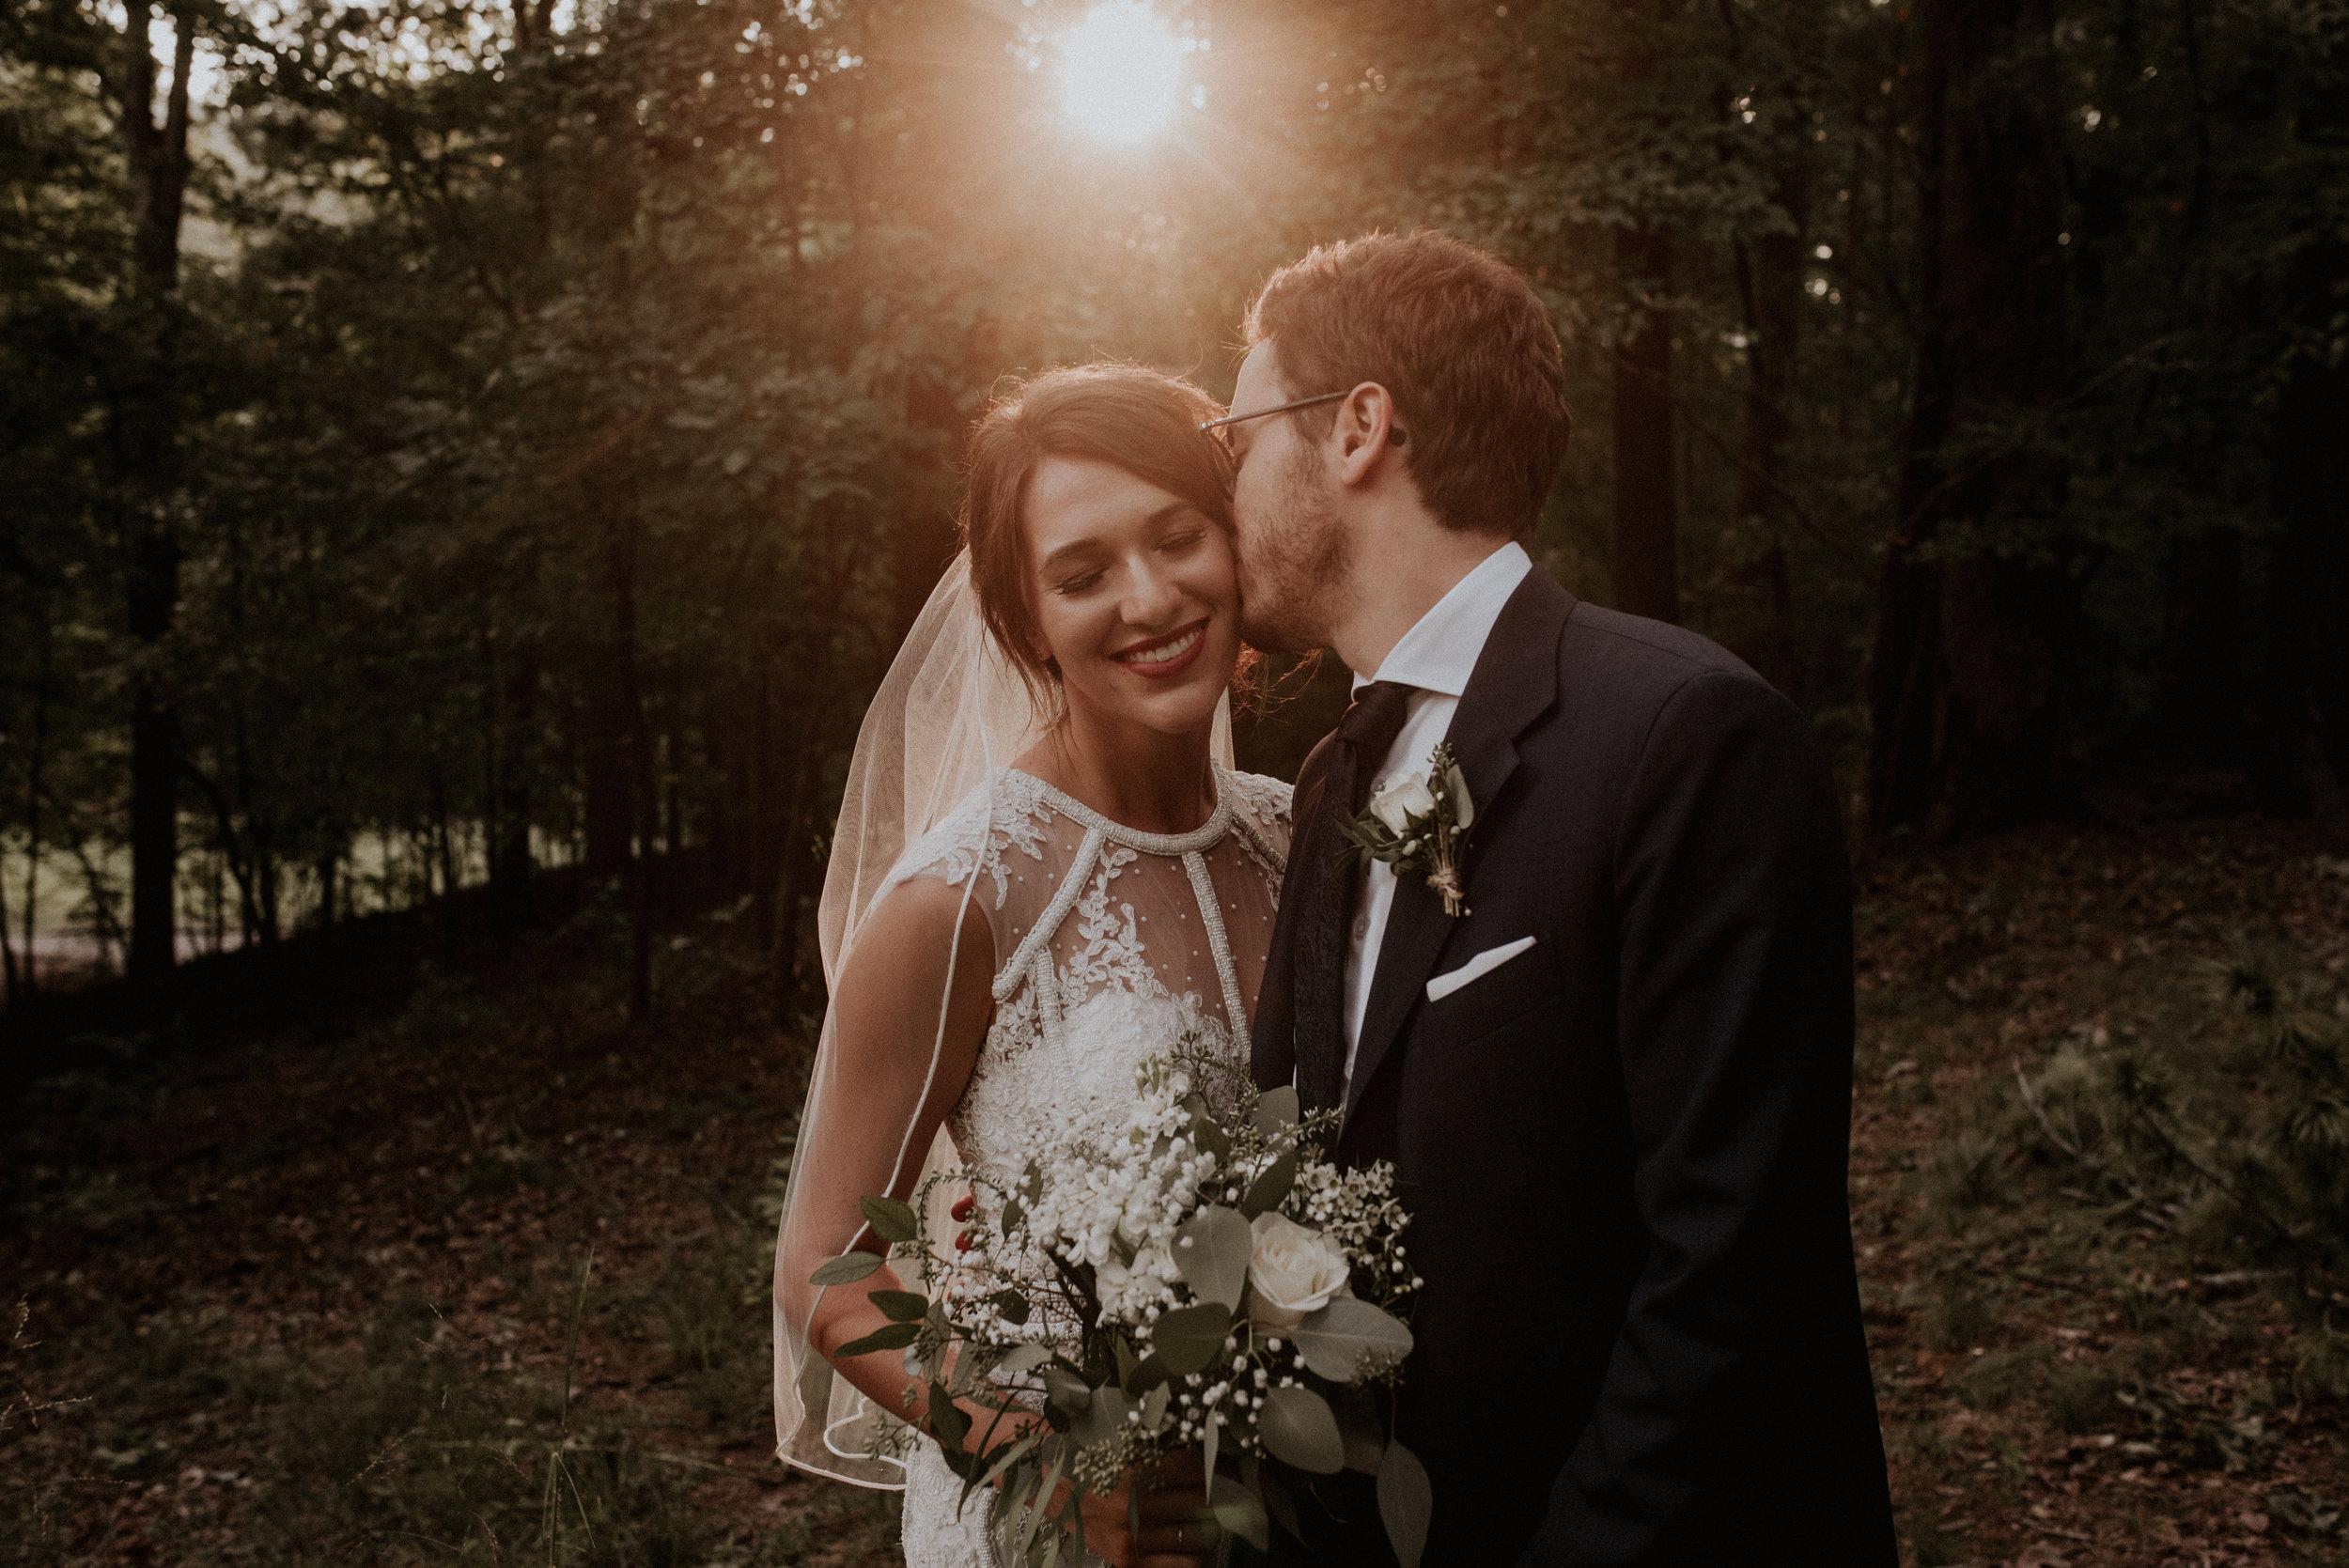 091617 - bailey + mattia wedding-408-2.jpg